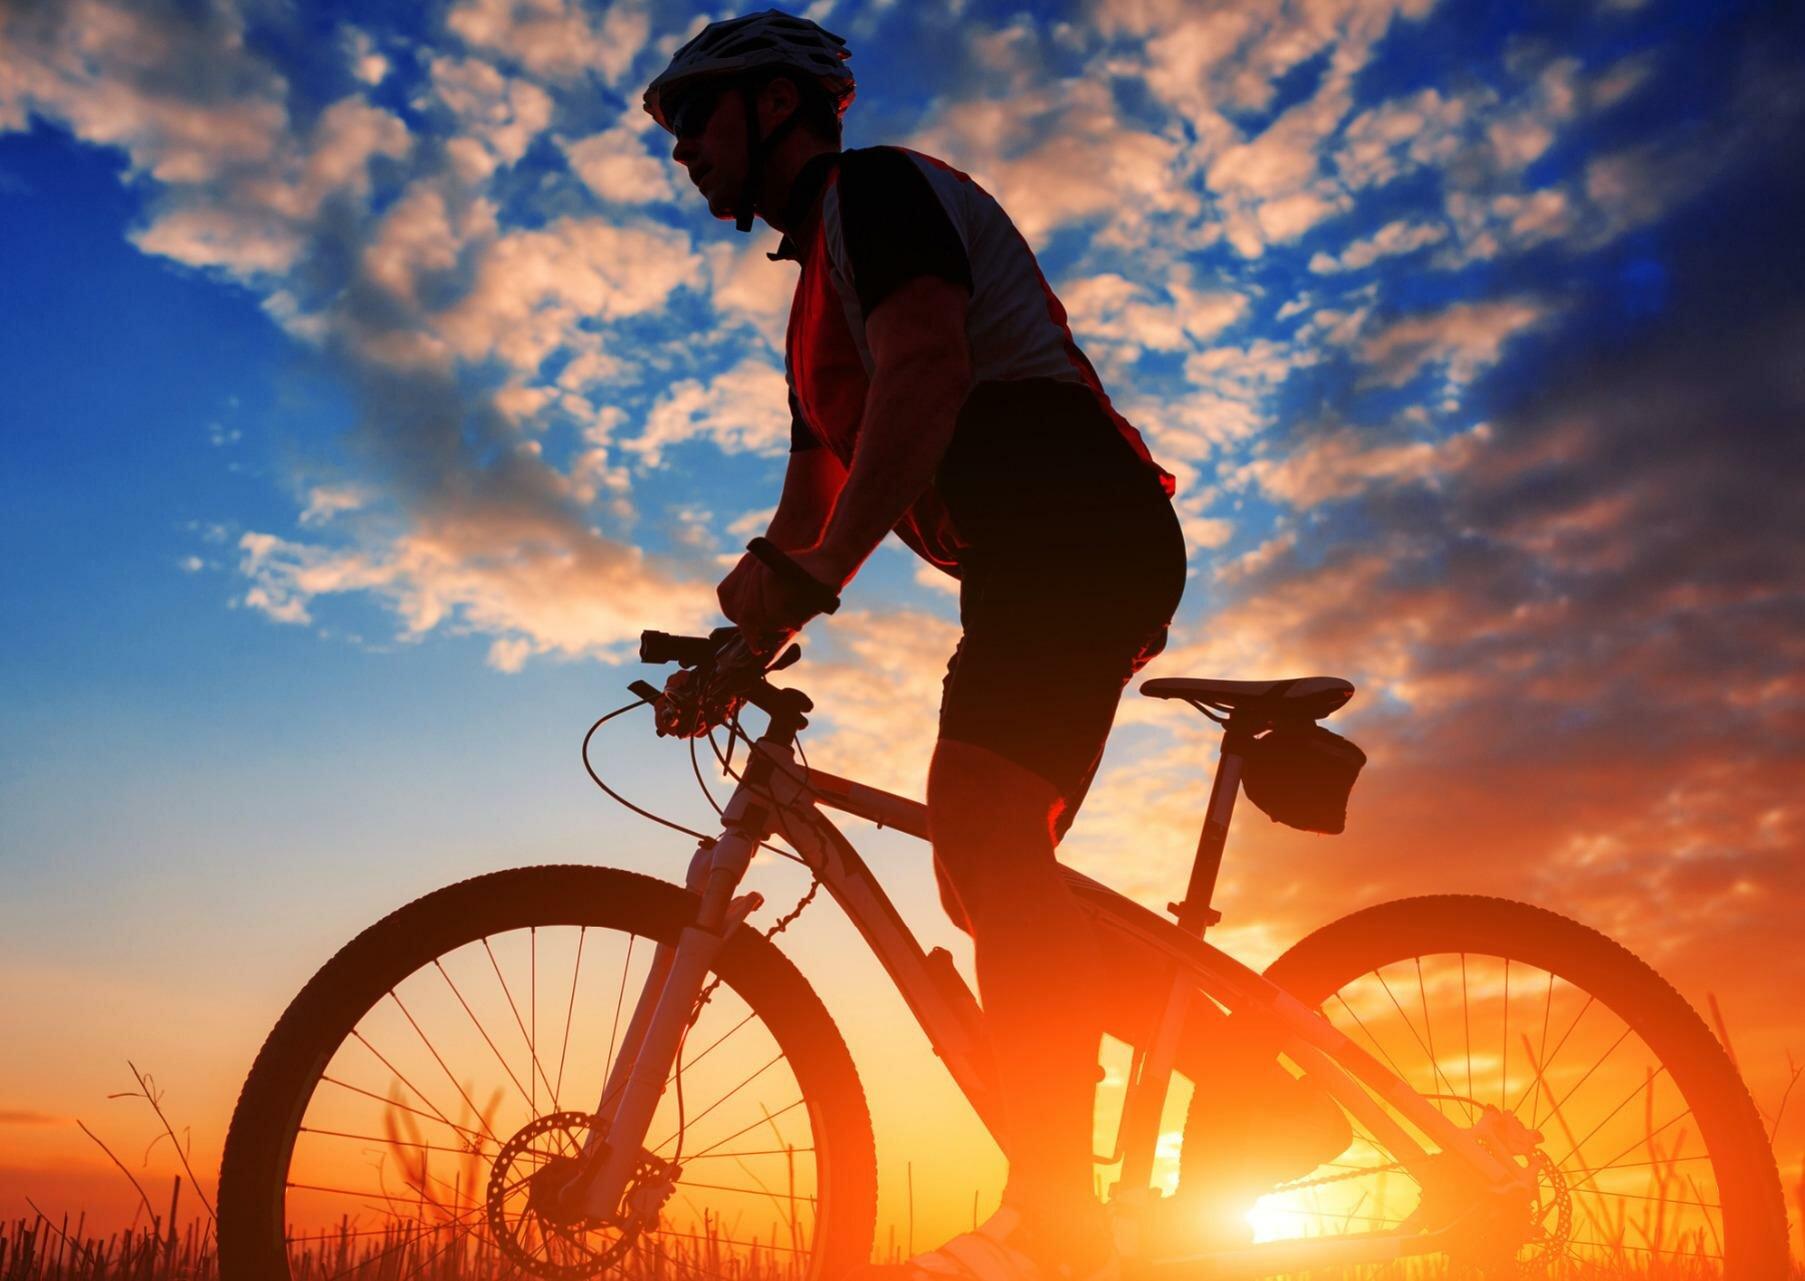 Кому полезен и кому вреден велосипед?